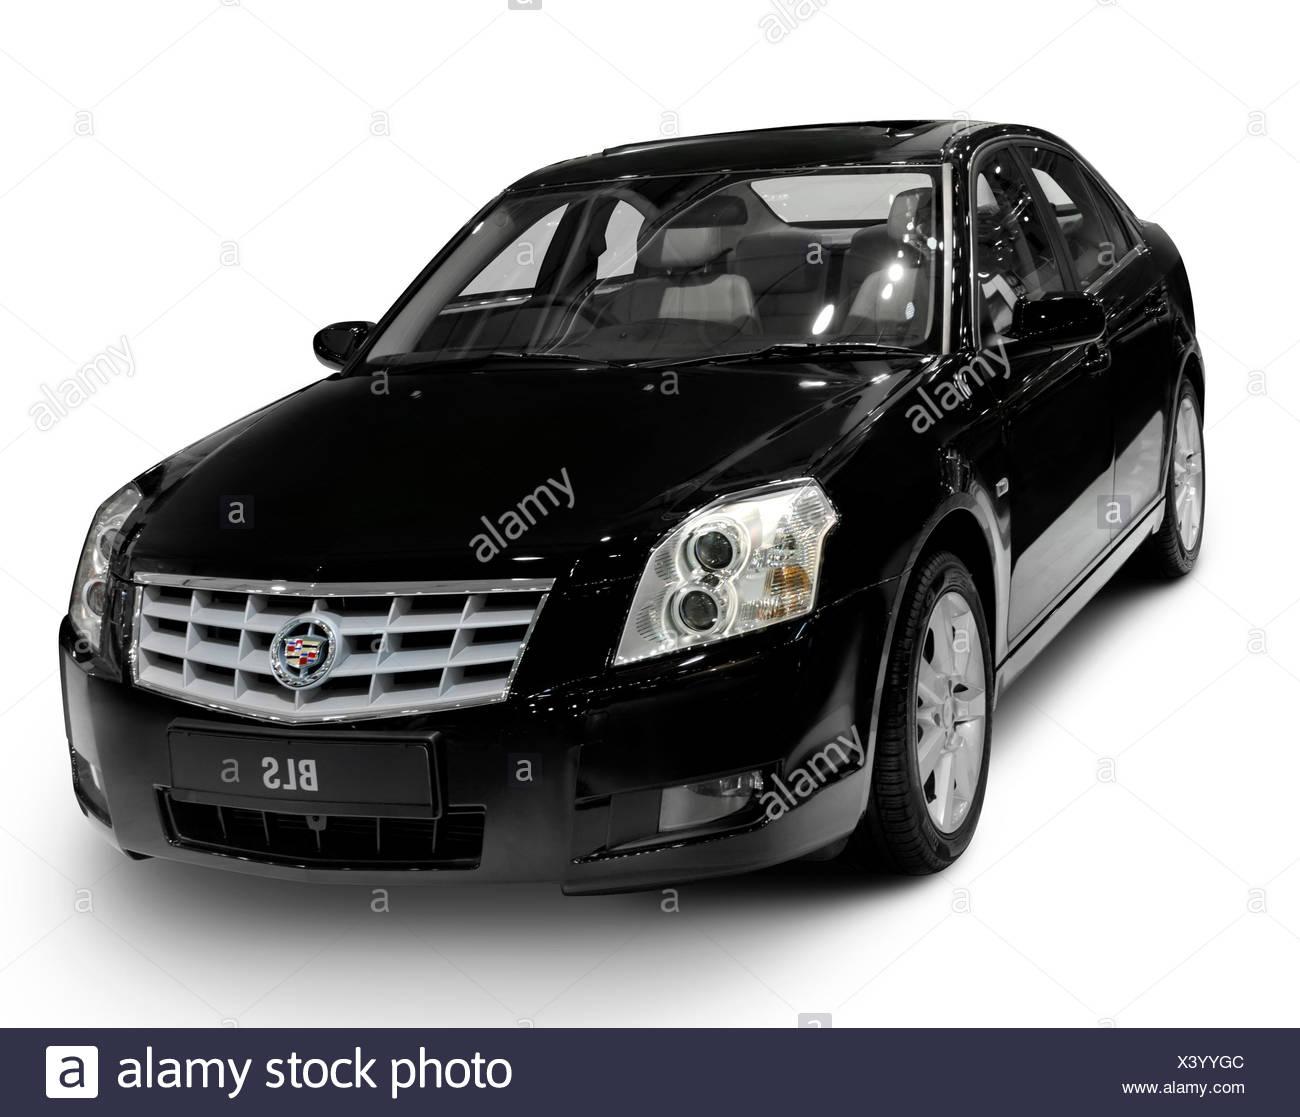 2012 Chrysler 300 Luxury Series 4k Hd Wallpaper: Black Sedan Stock Photos & Black Sedan Stock Images